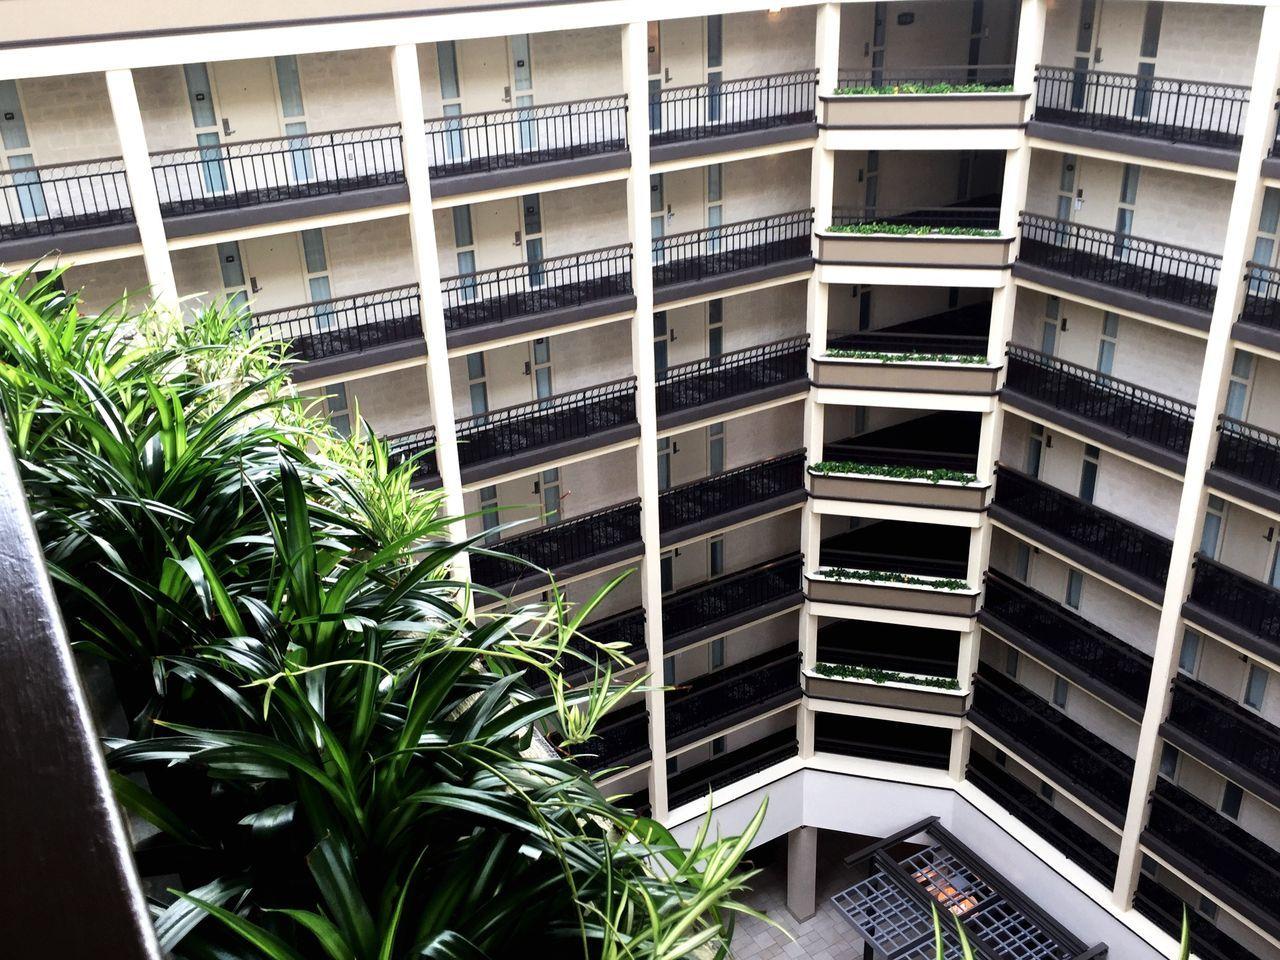 The Architect - 2017 EyeEm Awards Urban4 Architecture Built Structure Balcony Indoors